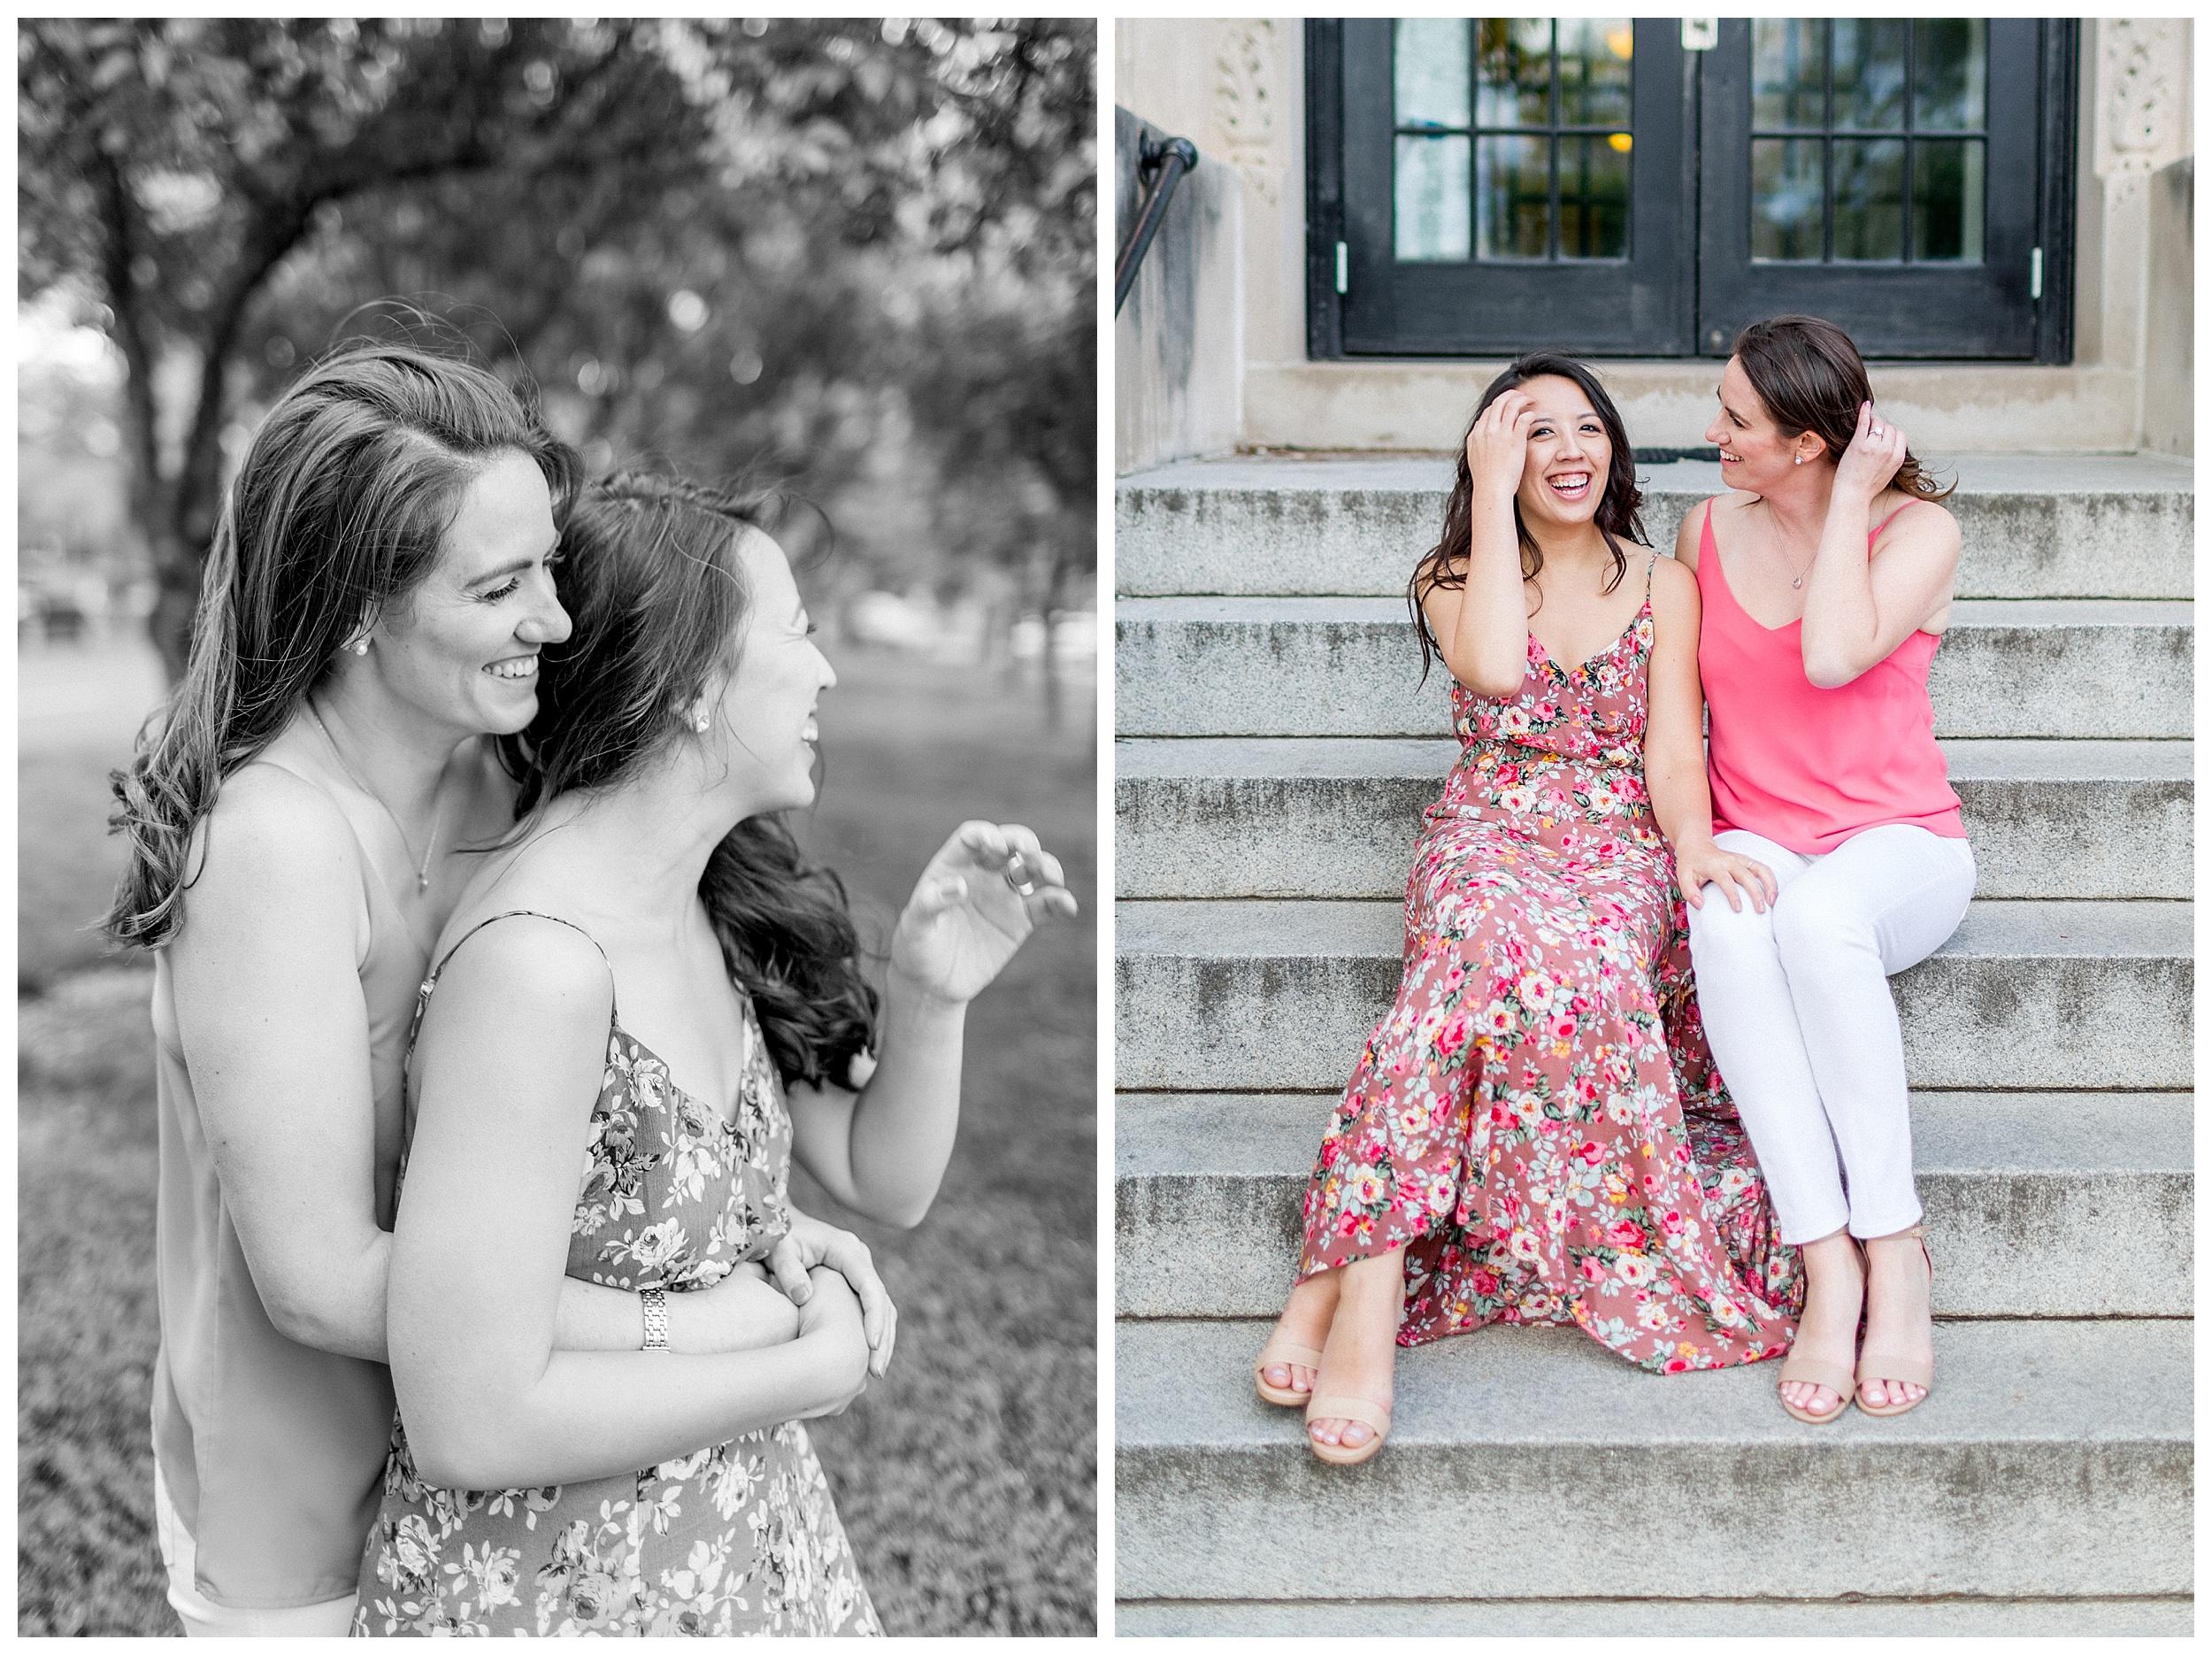 Same Sex DC Engagement | District of Columbia Wedding Photographer Kir Tuben_0010.jpg